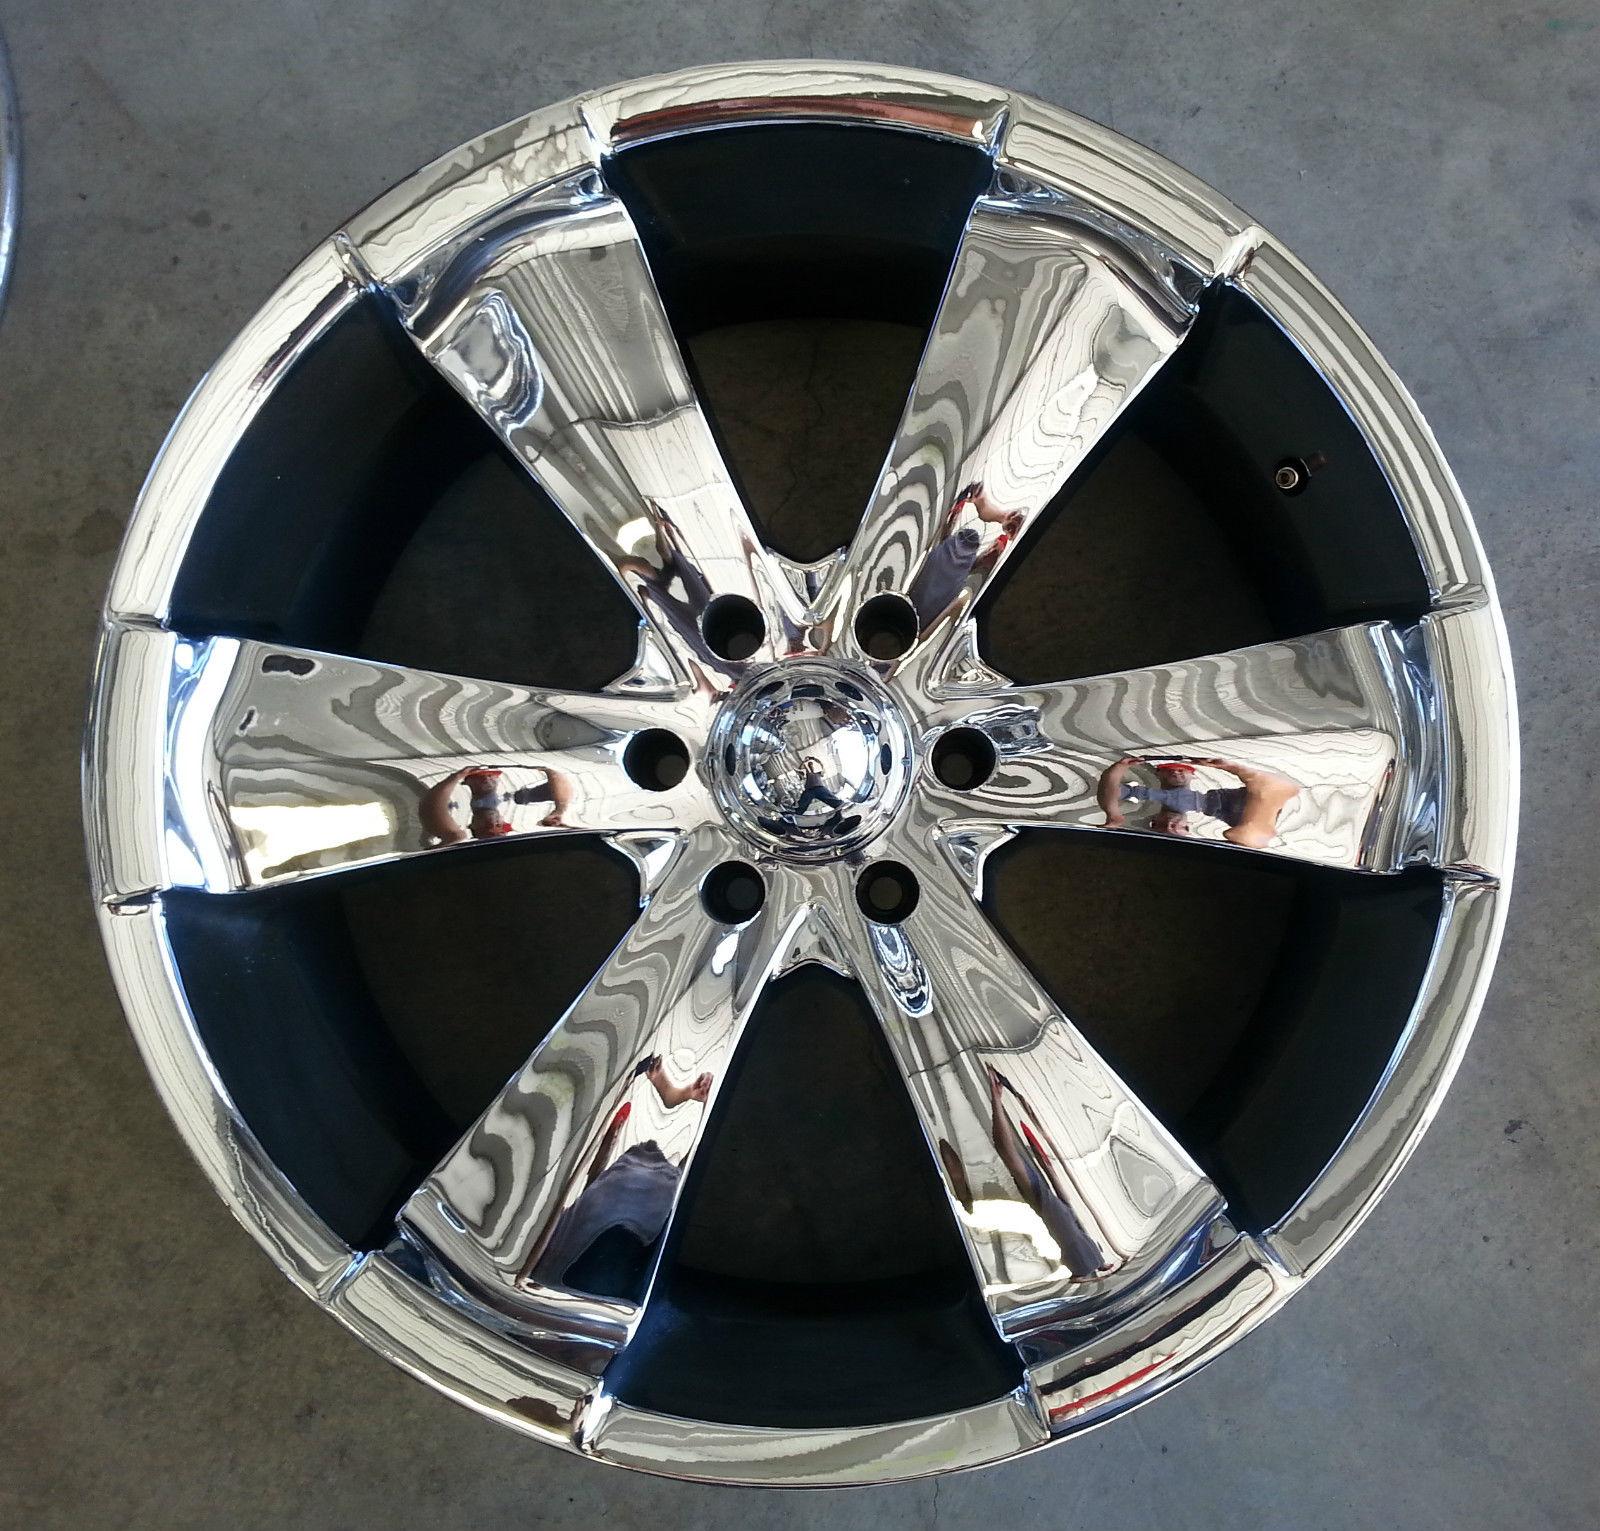 av wheel   mkw mk  wheels  chrome chevy gmc tahoe silverado chevrolet mk